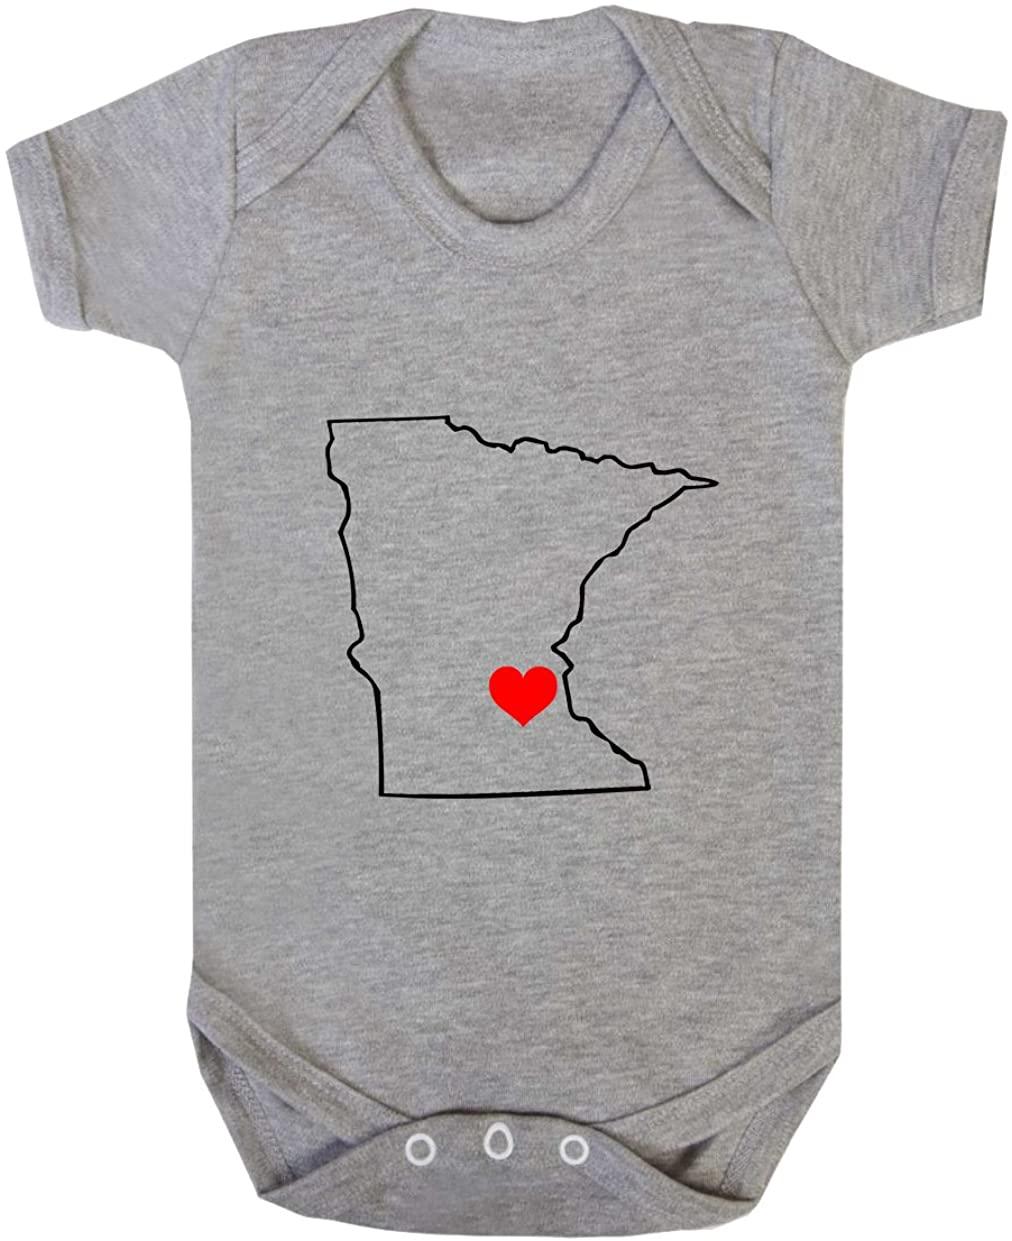 Minnesota Heart Love Baby Bodysuit One Piece Oxford Gray Newborn